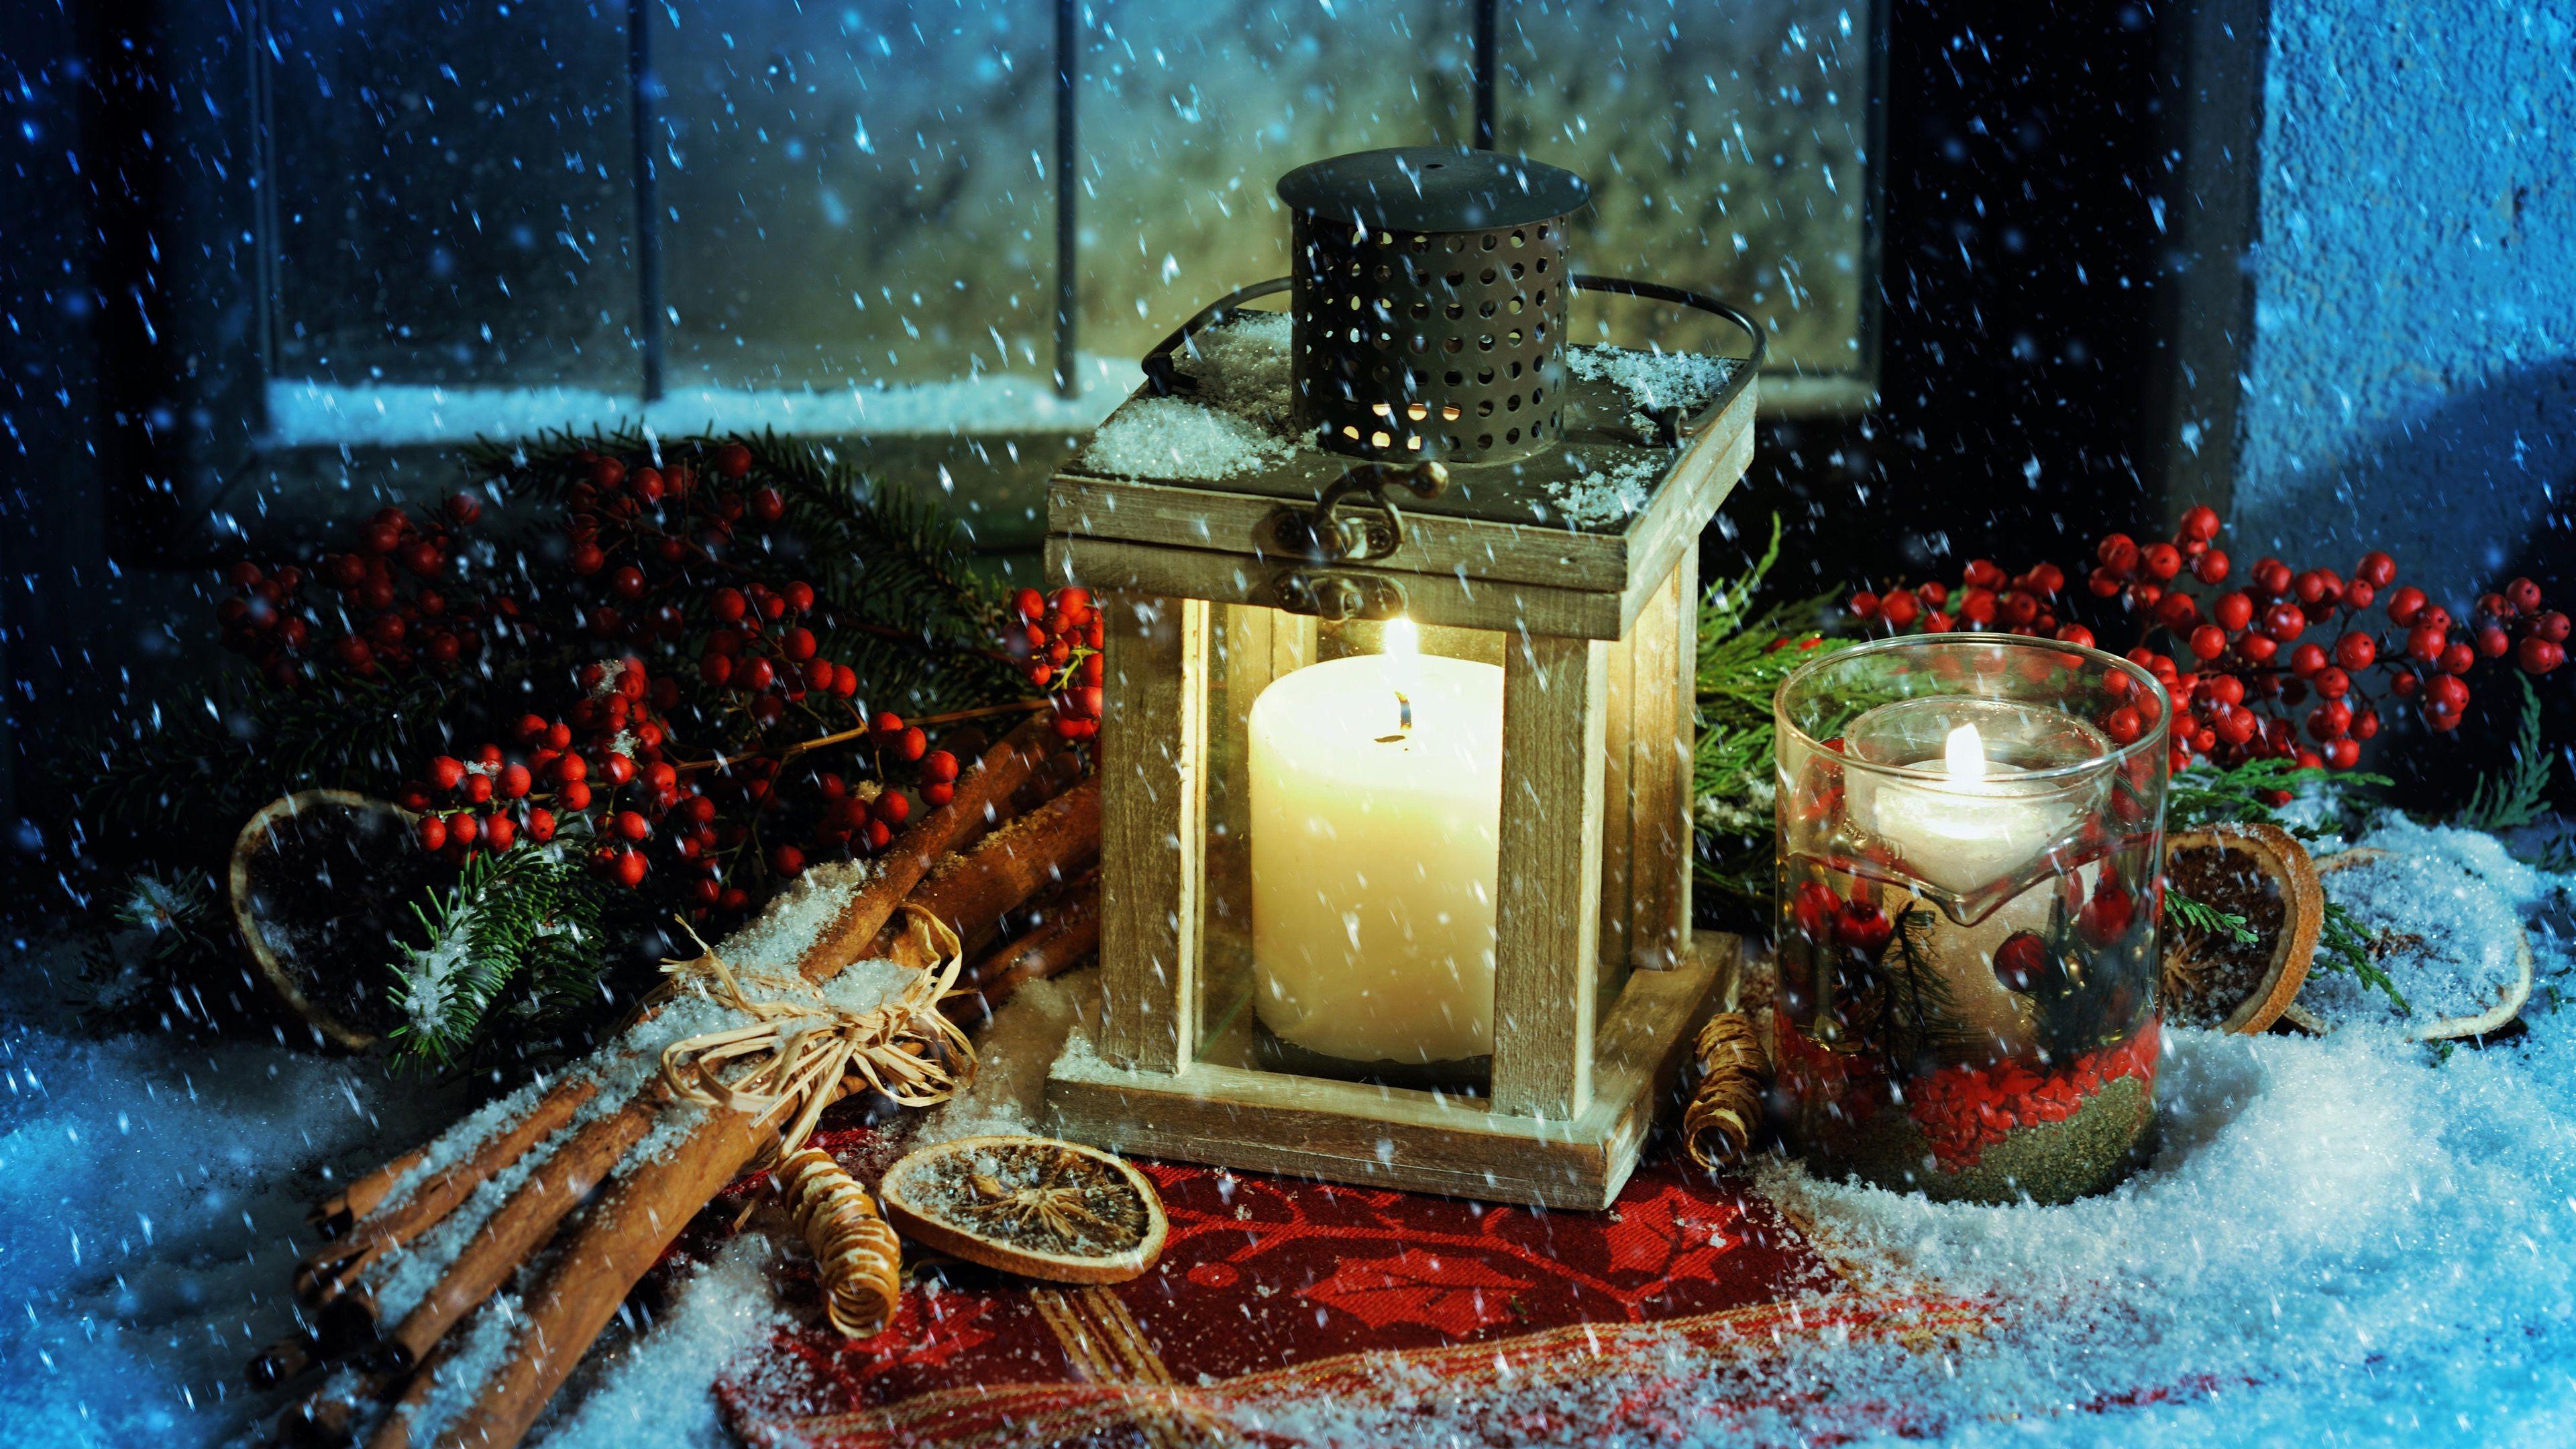 No l th me lanterne bougies feu neige fonds d 39 cran for Fond ecran jul